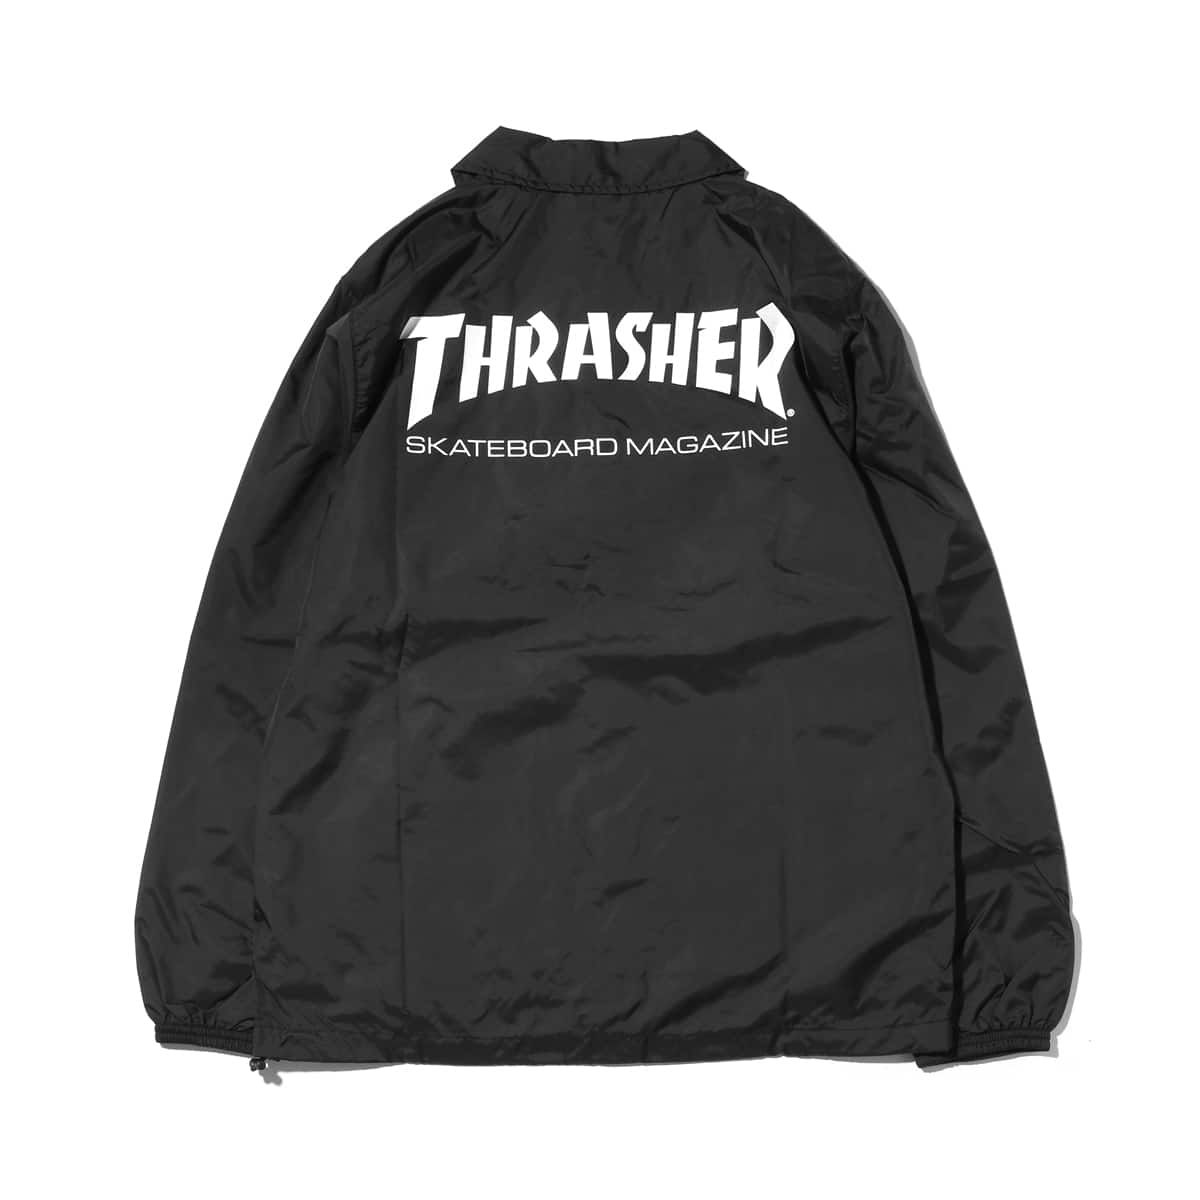 """THRASHER MAG LOGO COACH JACKETBLACK/BURGUNDY 18FW-I""_photo_2"